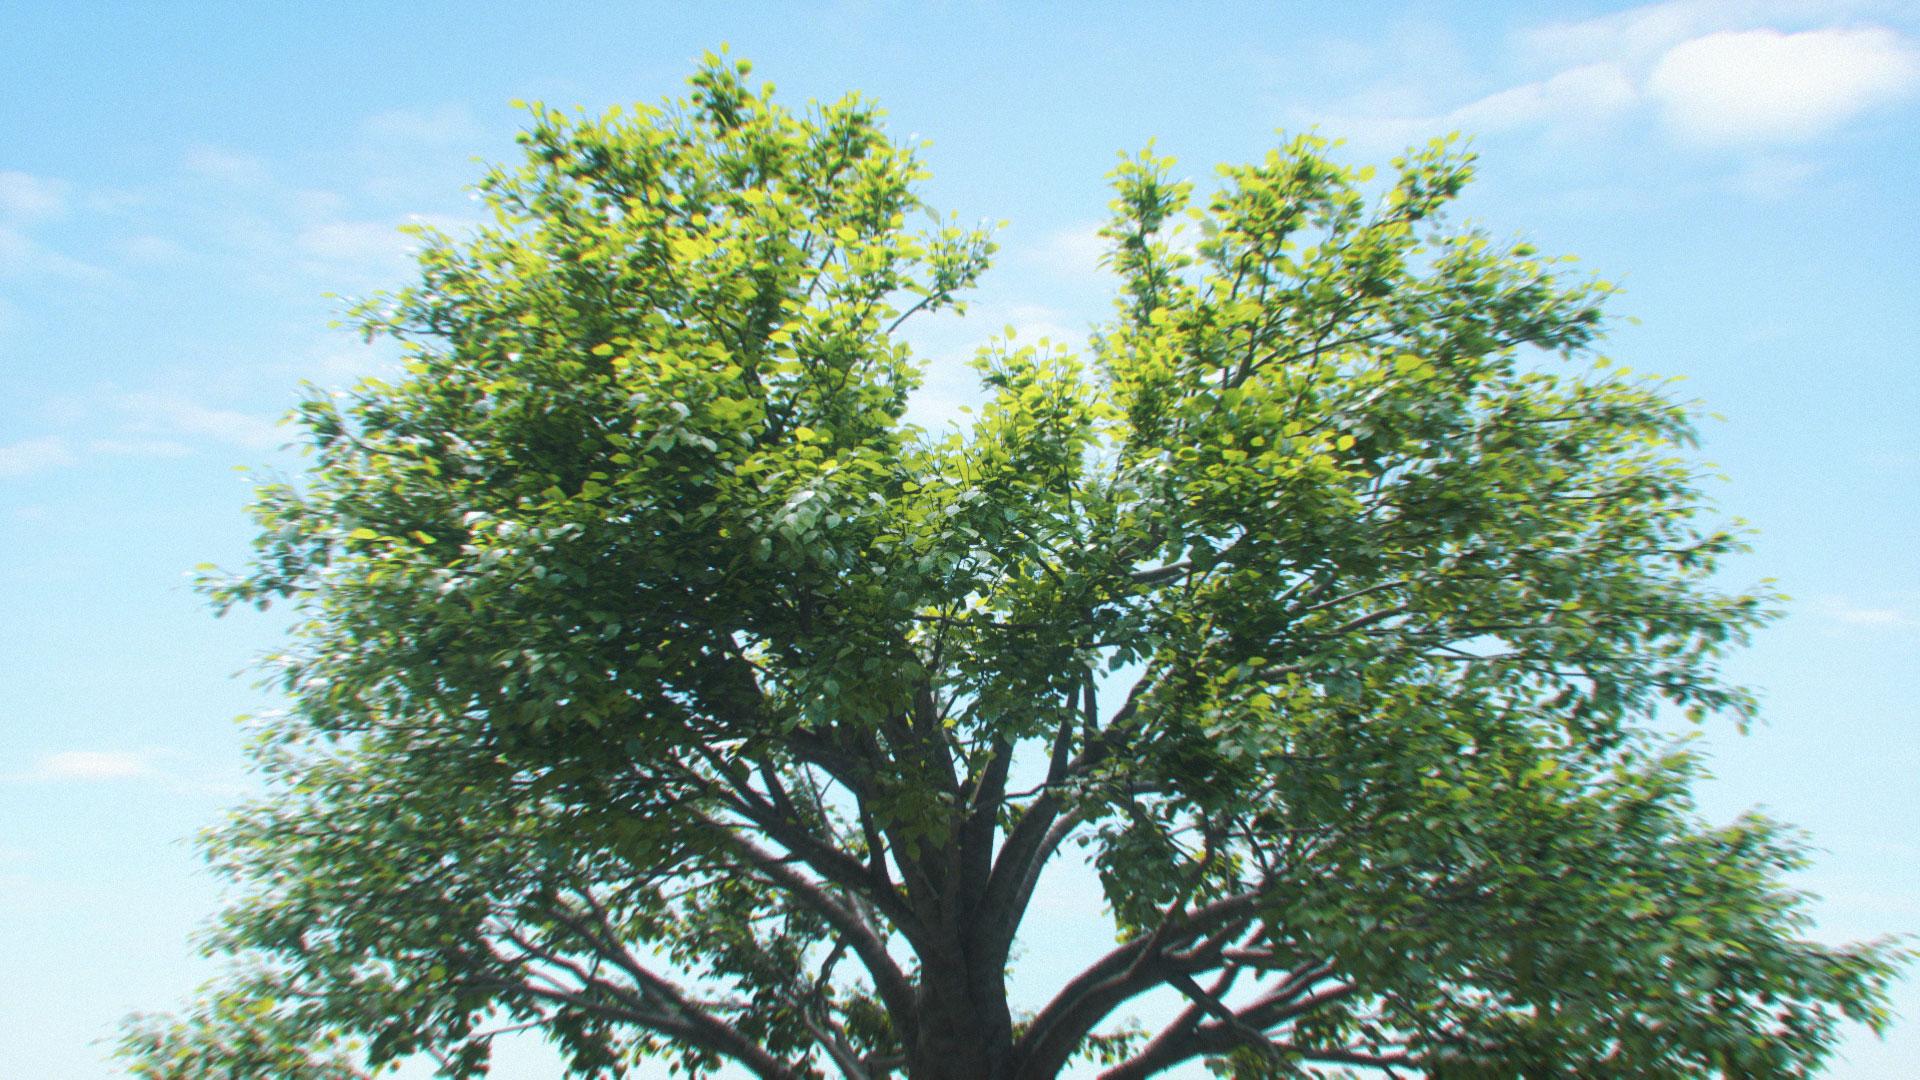 Tree_01_0002-0000000